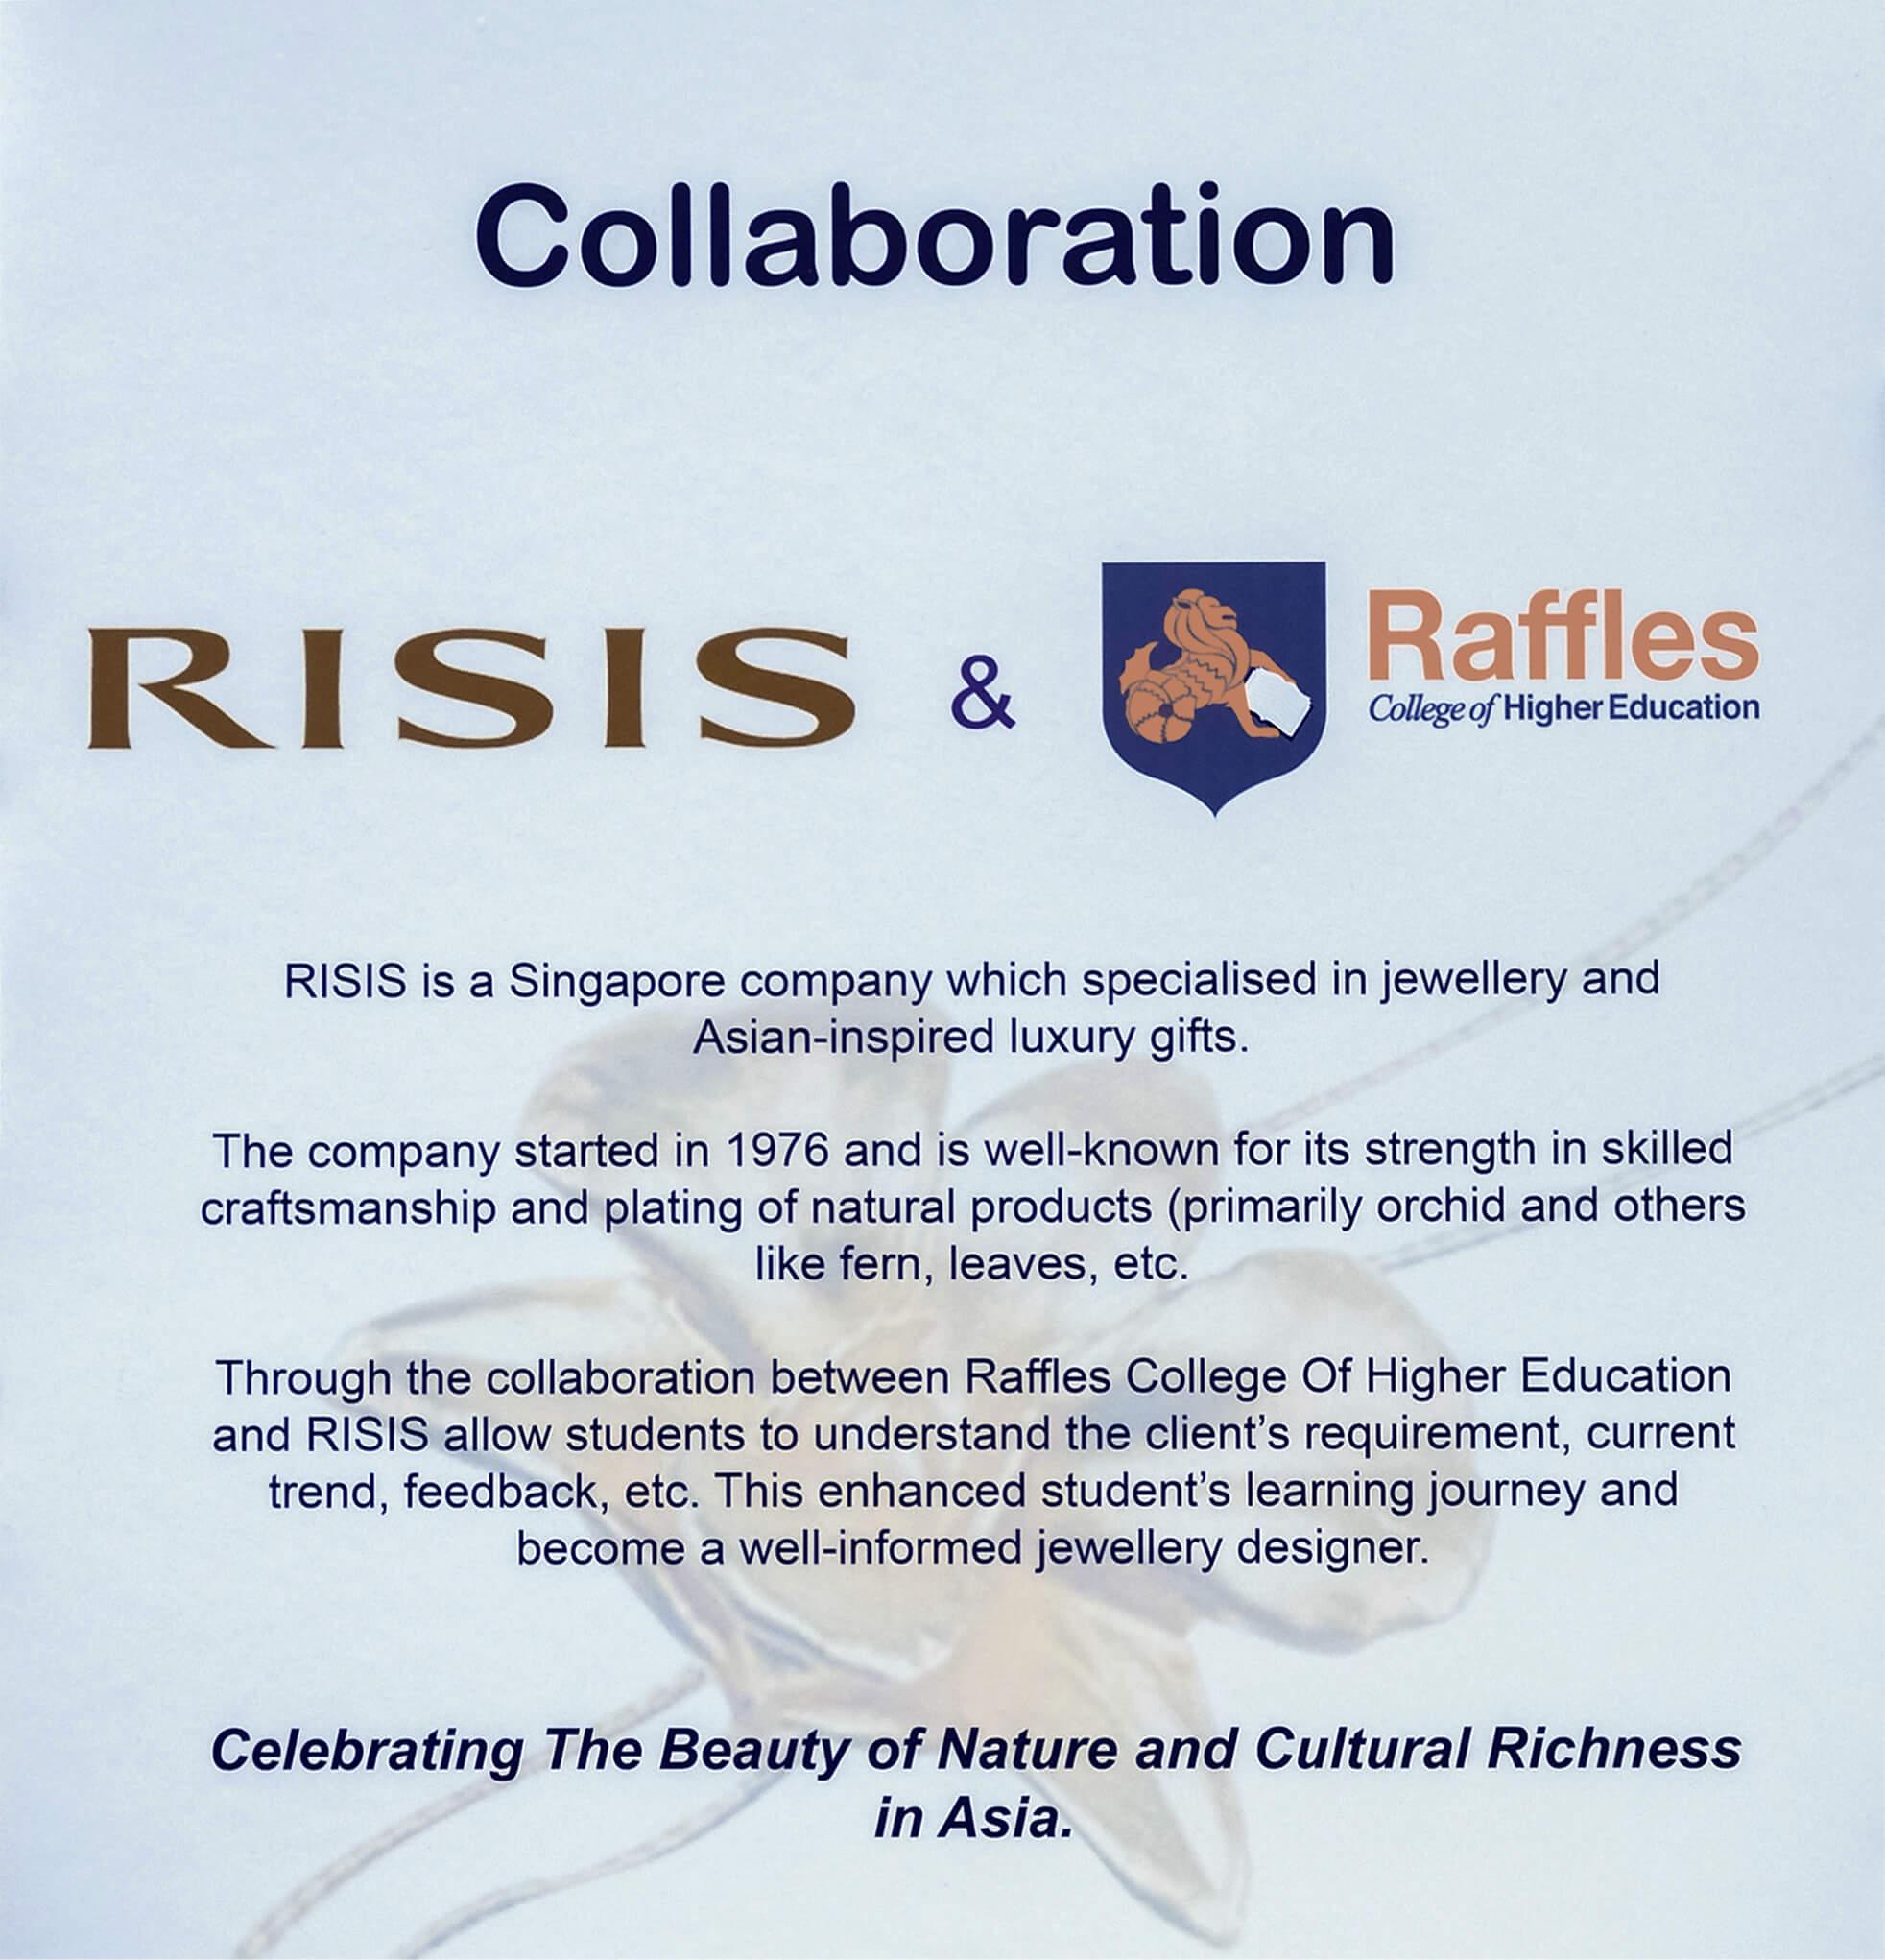 RISIS x Raffles Collaboration Poster 2020